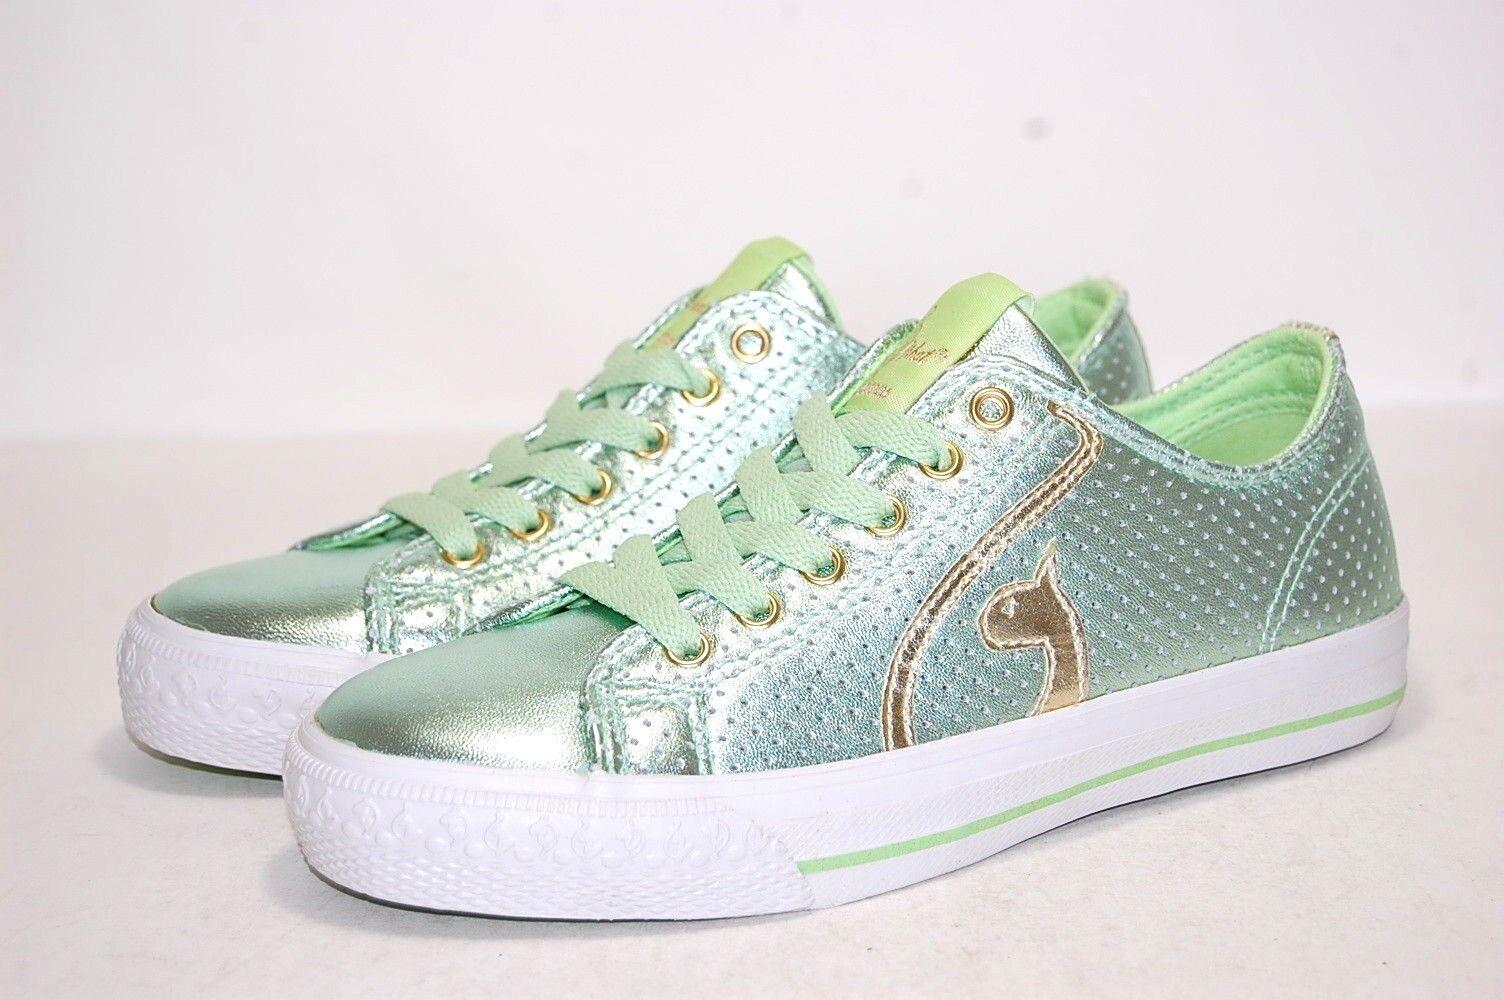 Baby Phat BP Lo Perf BP50812 Green Classic  Chaussures  femmes